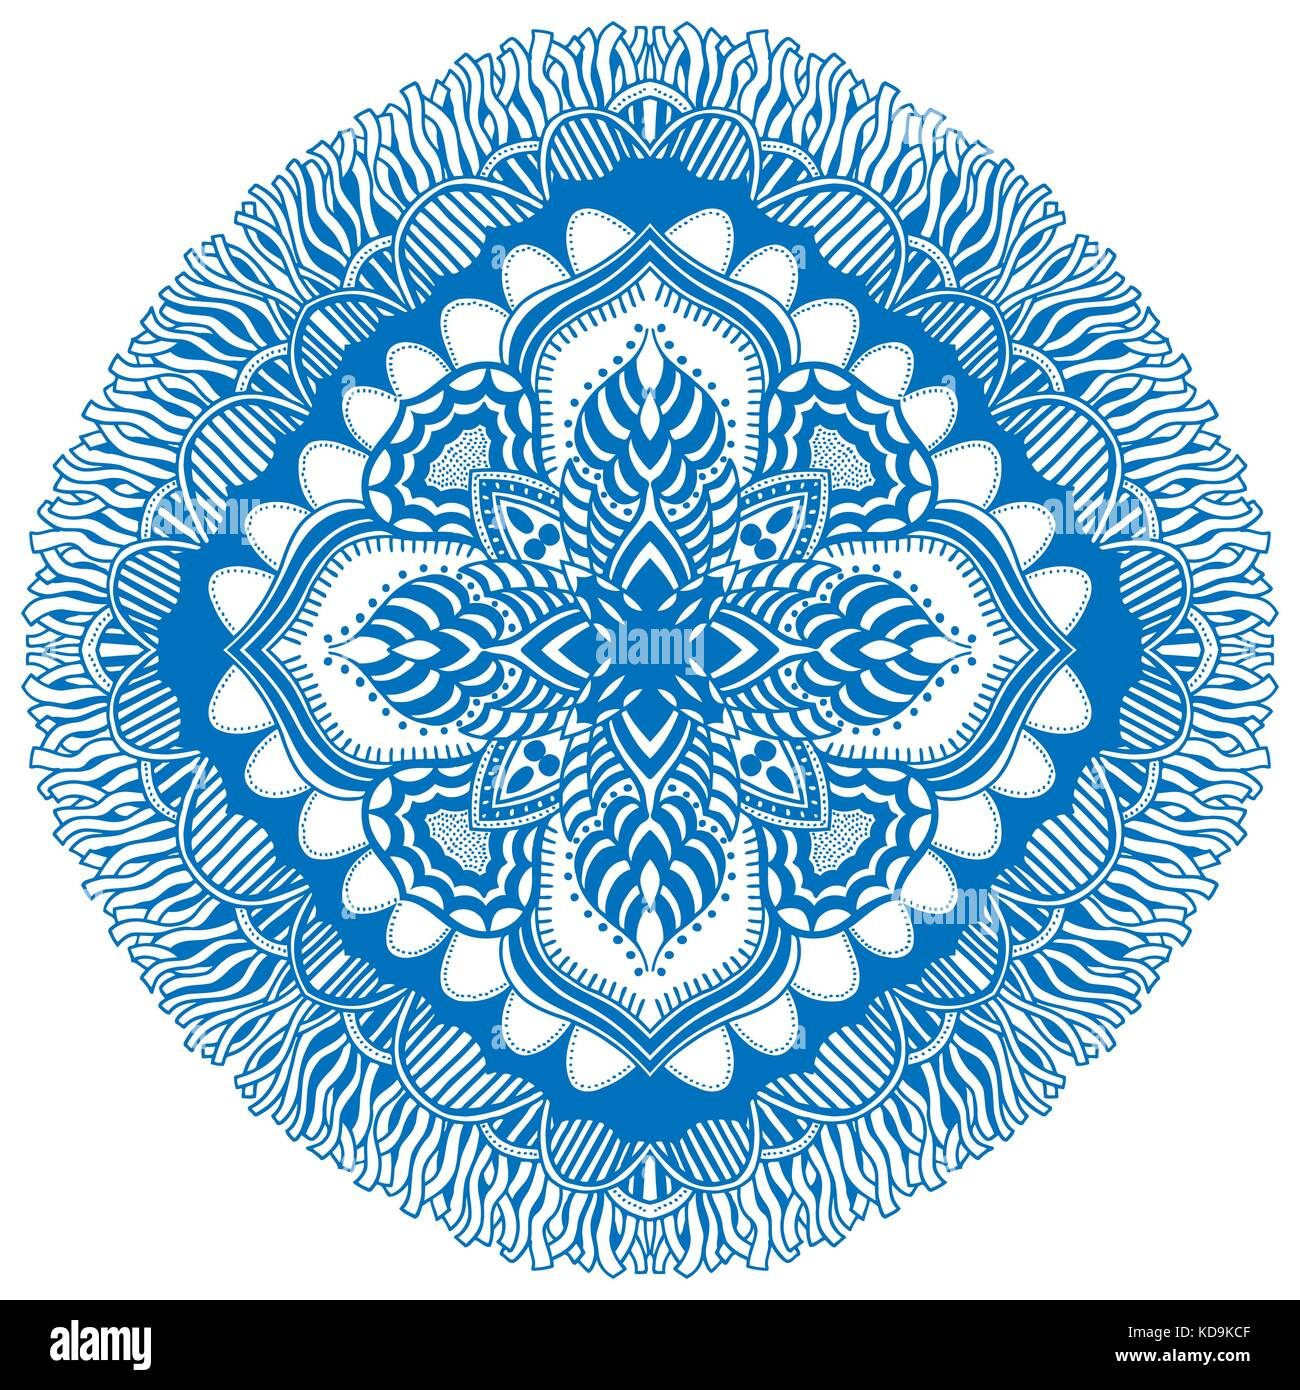 b7b77e317 Abstract floral ornament Mehndi Henna Tattoo Mandala, Yantra brown. Vintage  vector banner frame card for text invitations for wedding birthday celebra